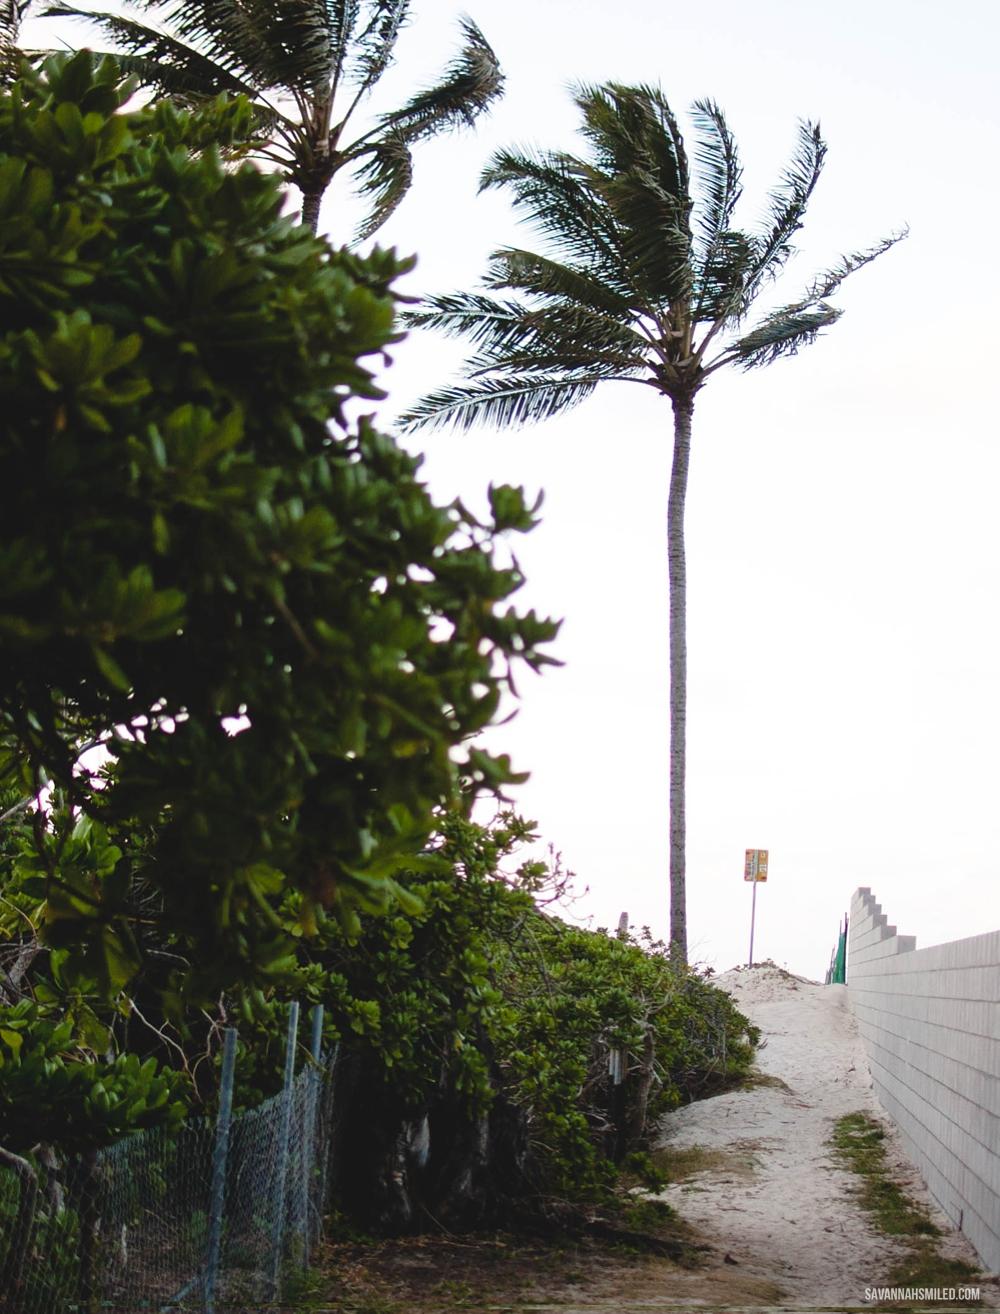 kailua-beach-hawaii-6.jpg